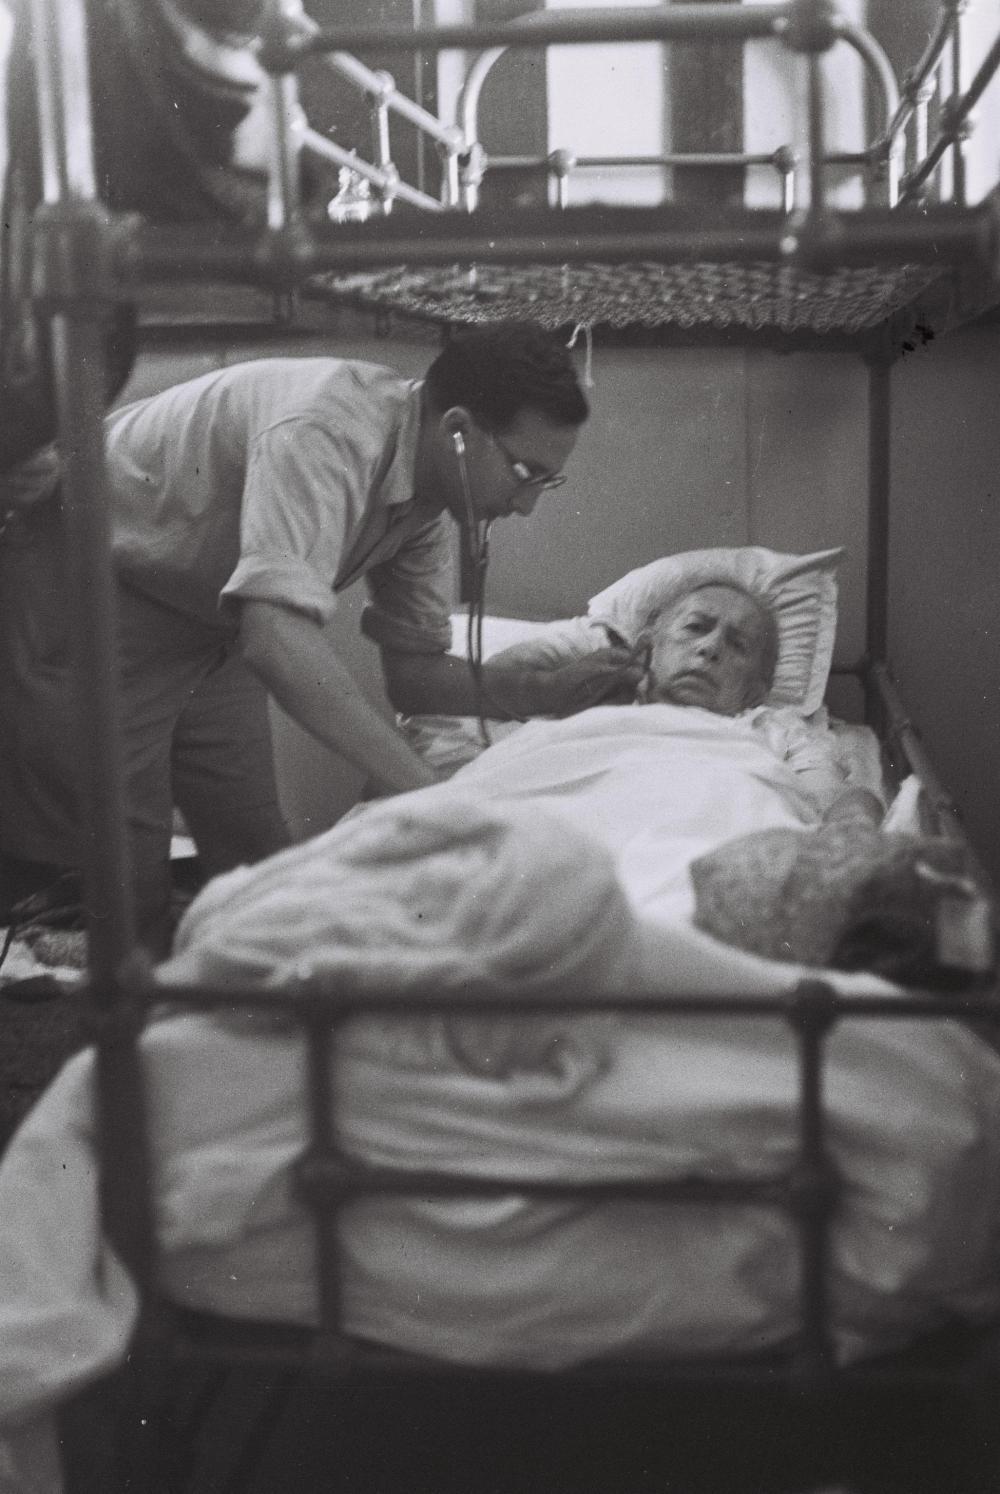 A doctor examining a sick immigrant